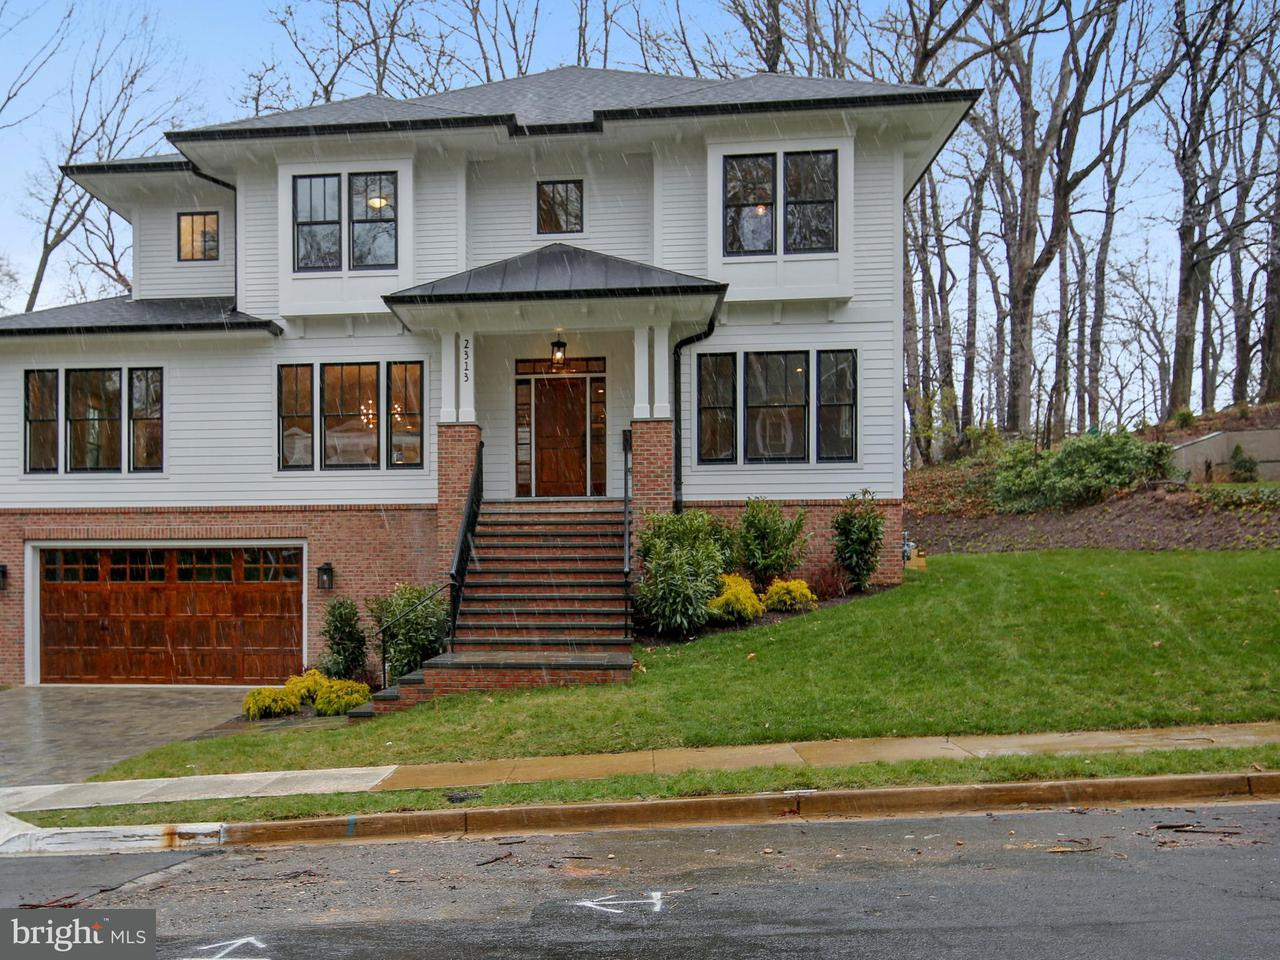 Single Family Home for Sale at 2313 N Trenton Street 2313 N Trenton Street Arlington, Virginia 22207 United States